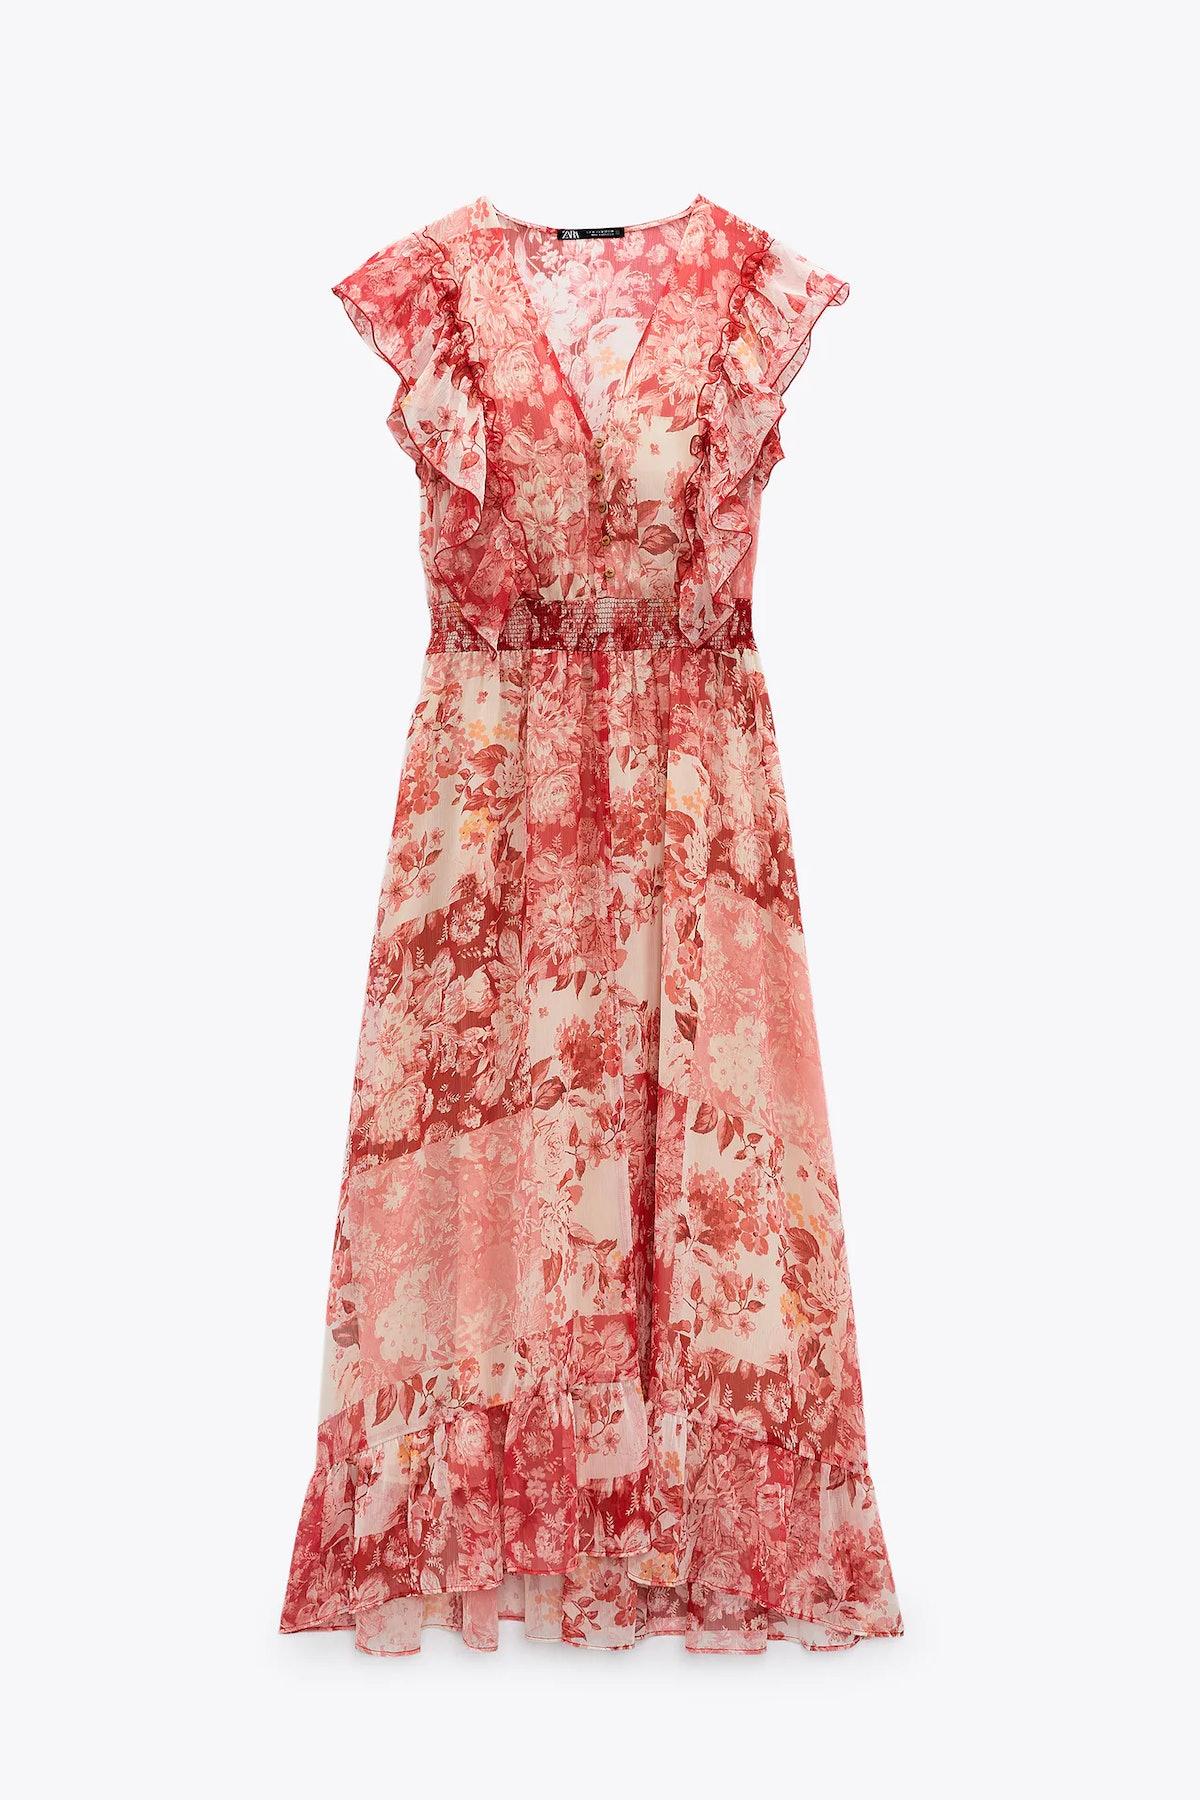 Zara Ruffled Print Dress